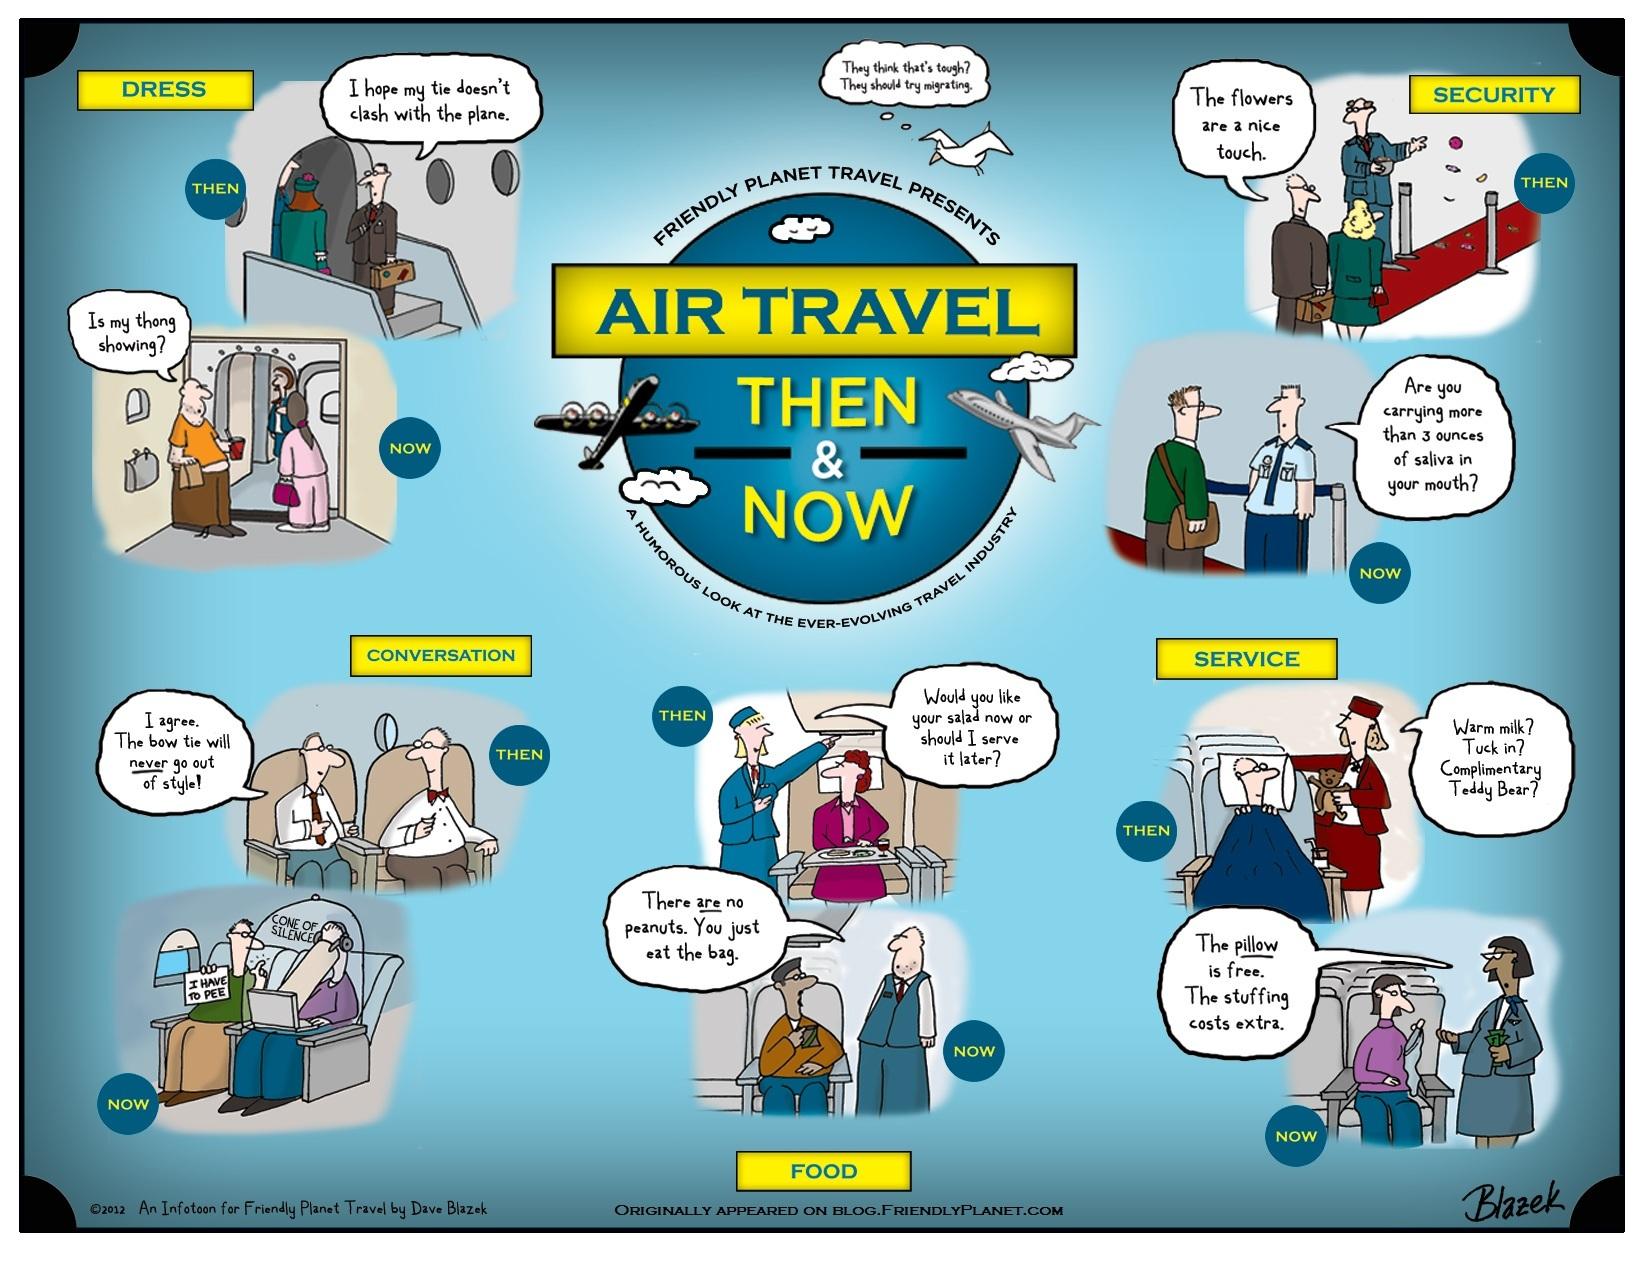 Air Travel Then Vs Air Travel Now